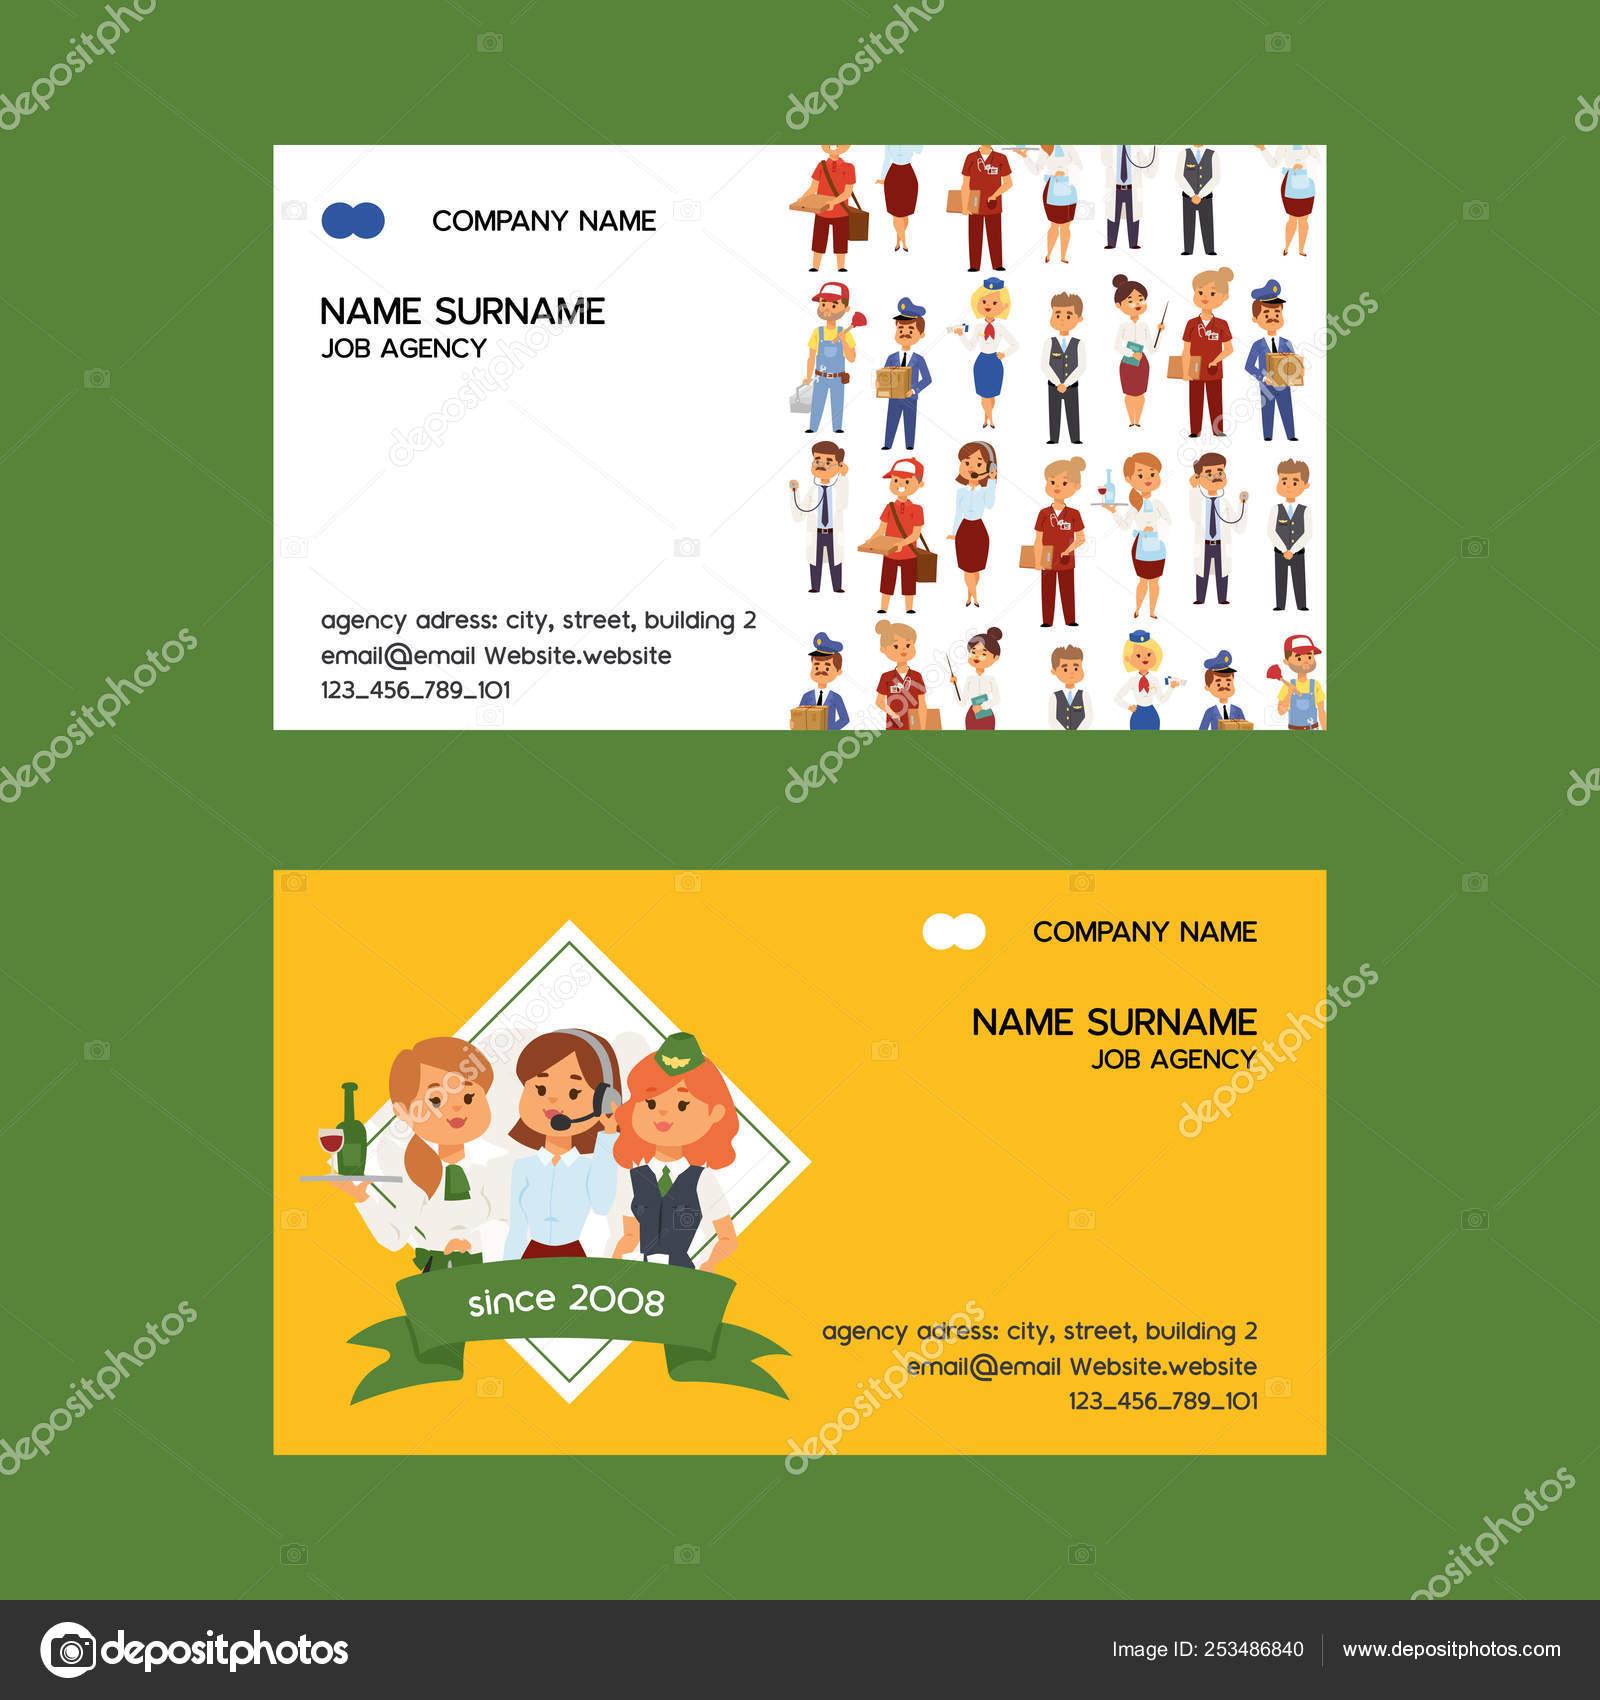 Job Agency Vector Business Card Woman Man Character Work